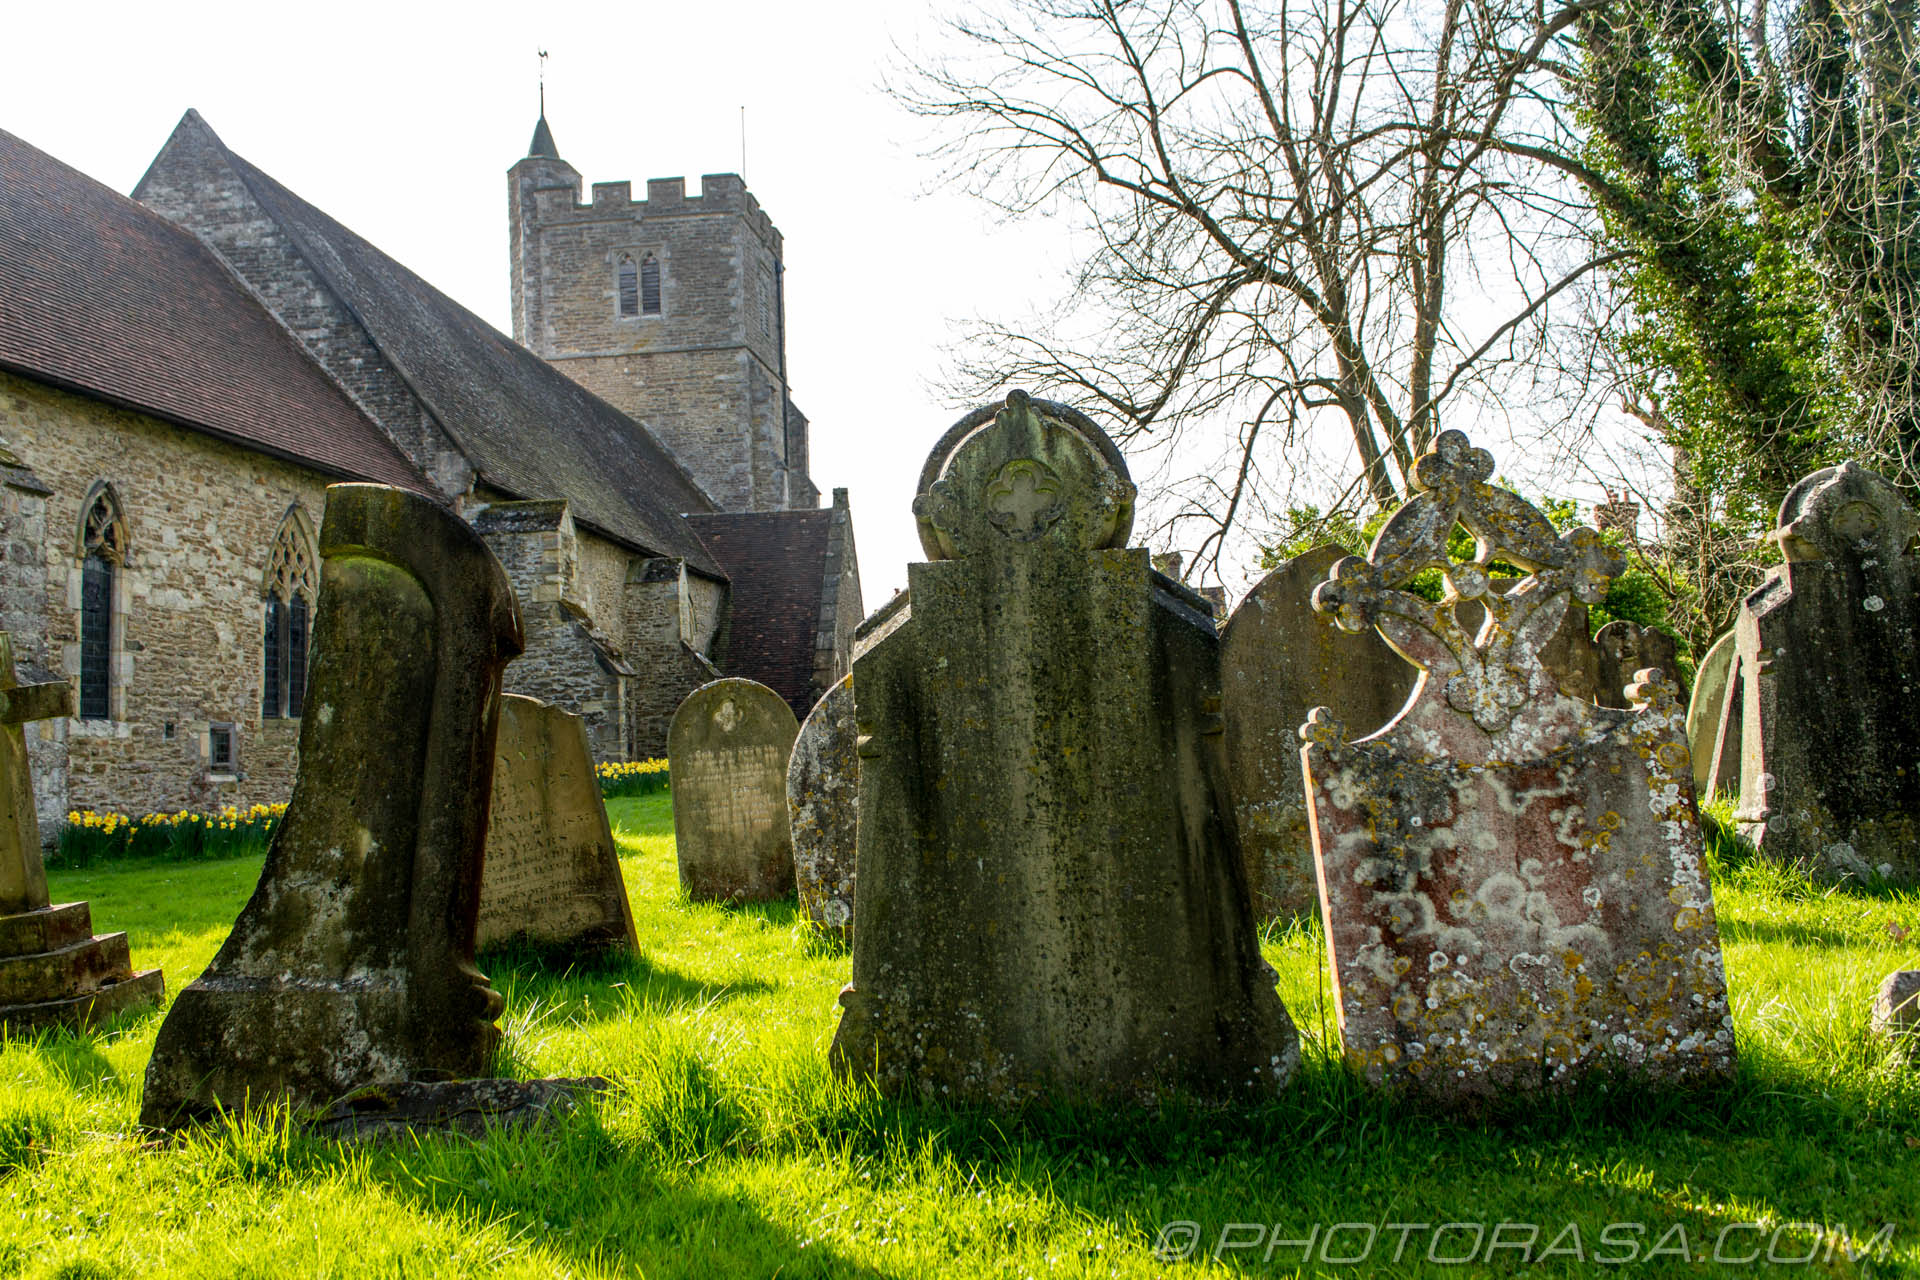 https://photorasa.com/saints-church-staplehurst-kent/old-unique-graves/